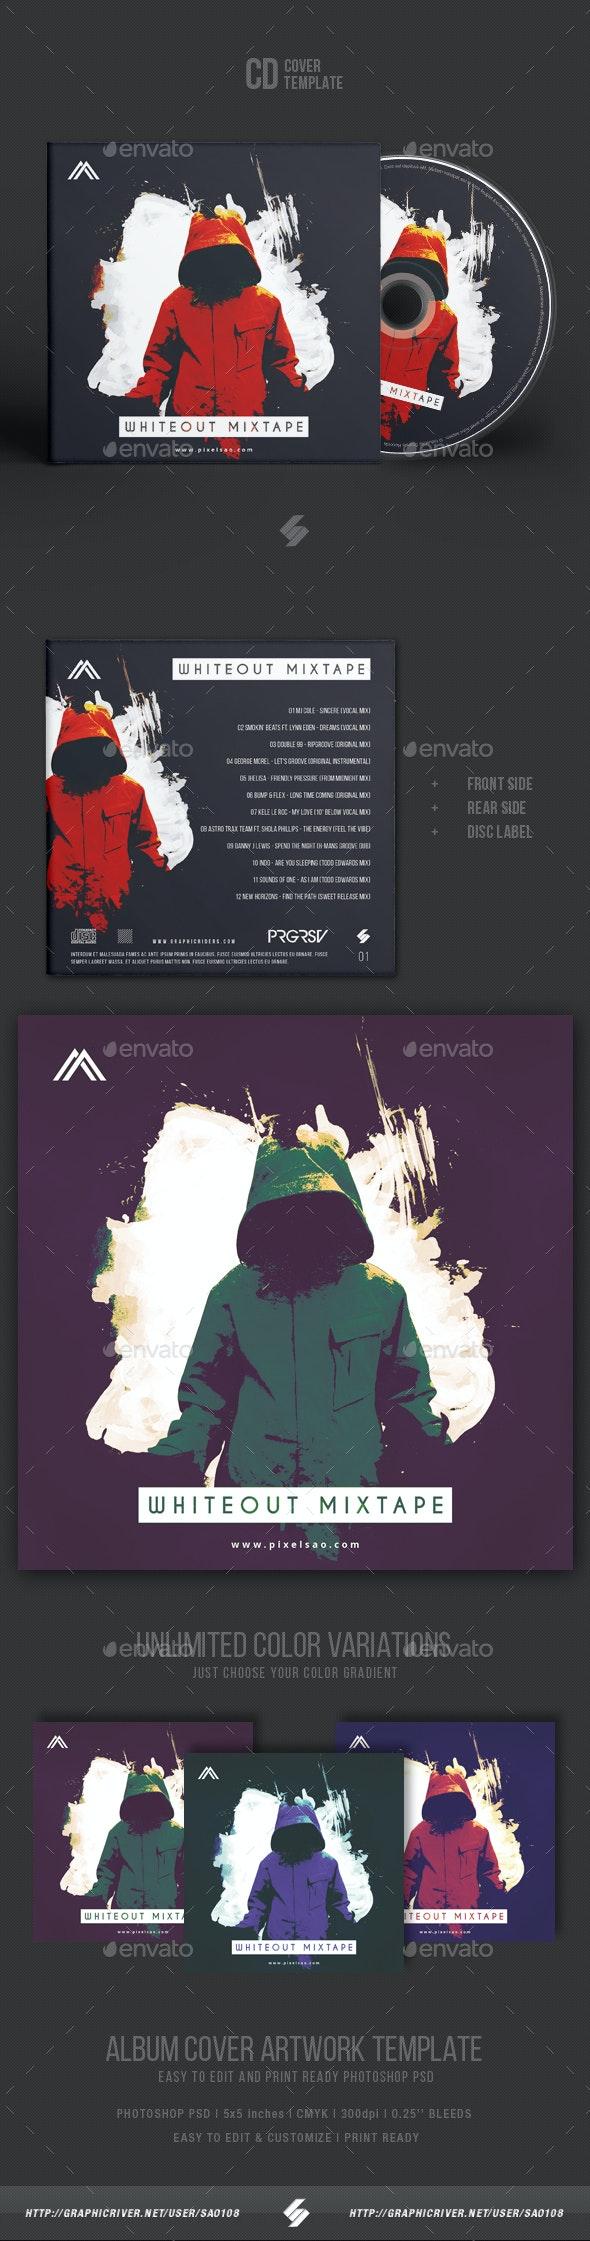 Whiteout Mixtape - CD Cover Artwork Template - CD & DVD Artwork Print Templates